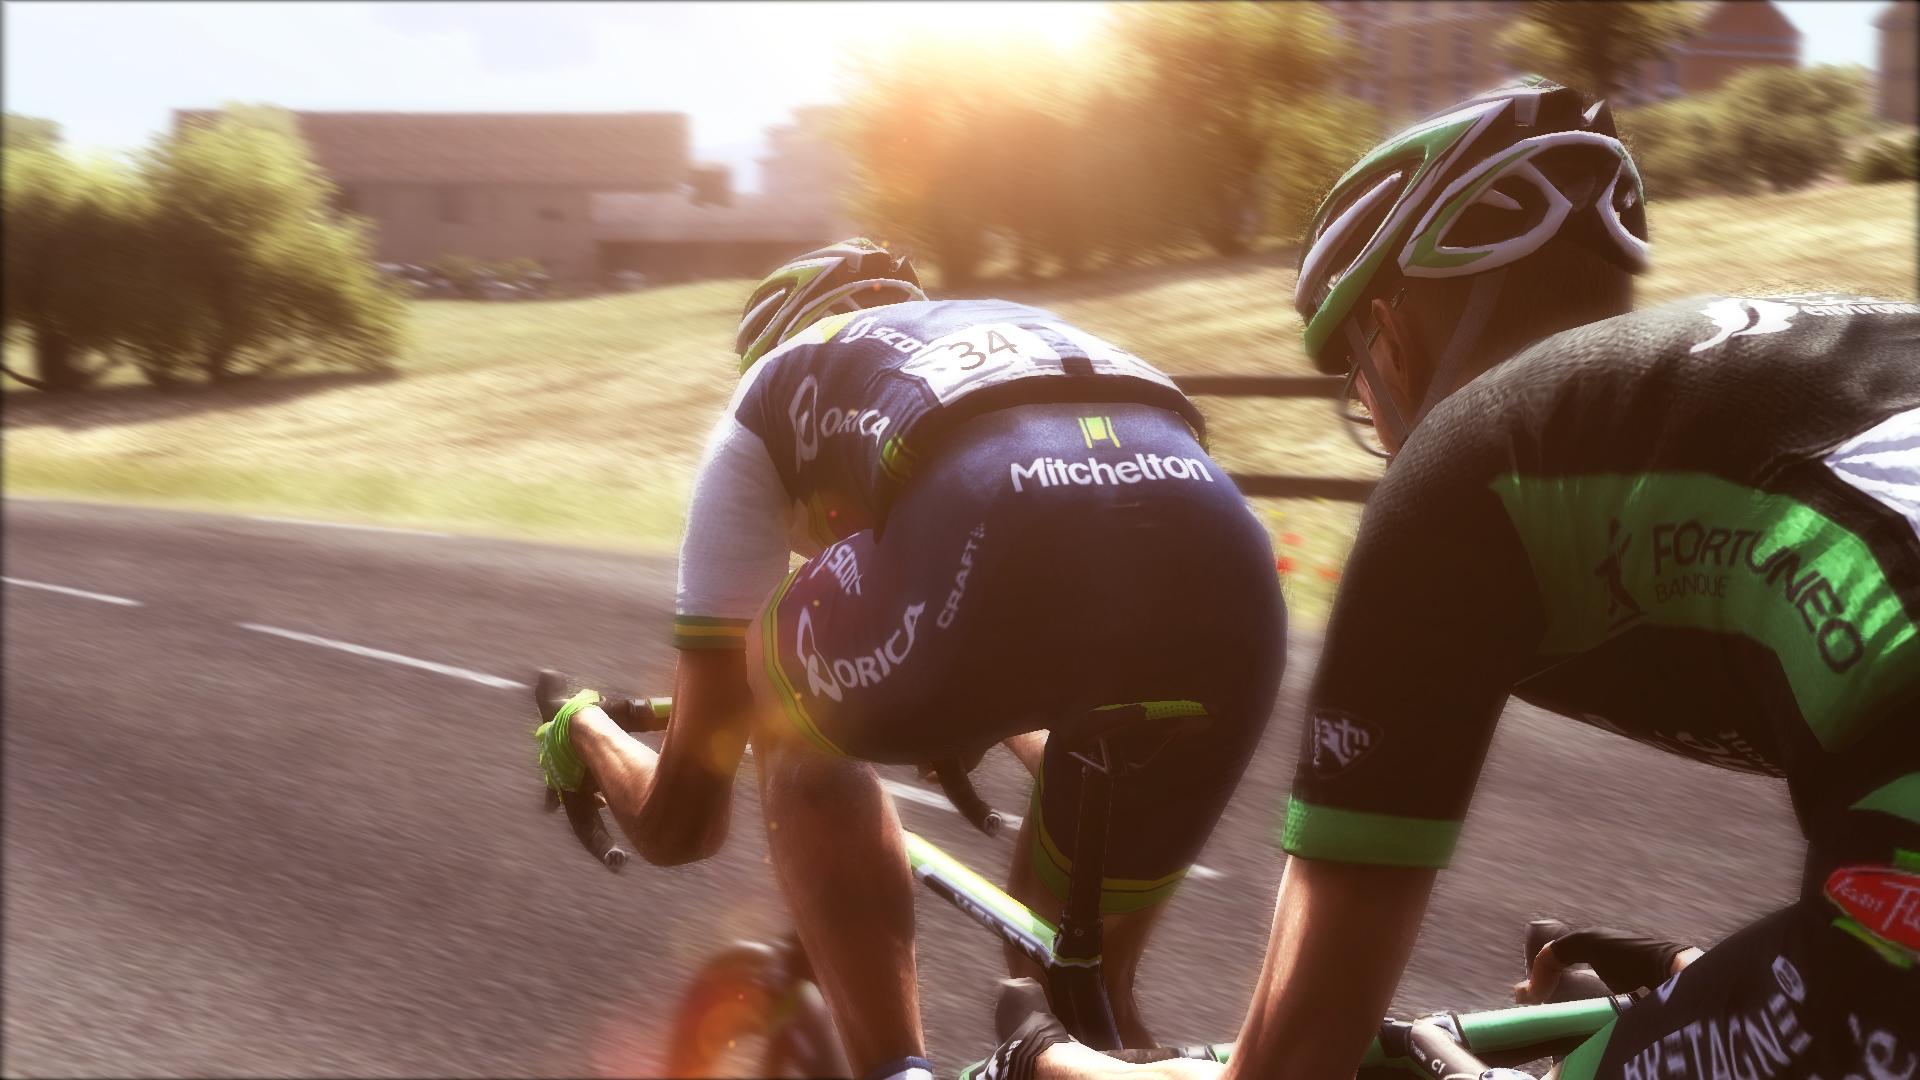 Pro Cycling Manager 2015 ESPAÑOL PC Full (CODEX) + REPACK PROPER 1 DVD5 (JPW) 1